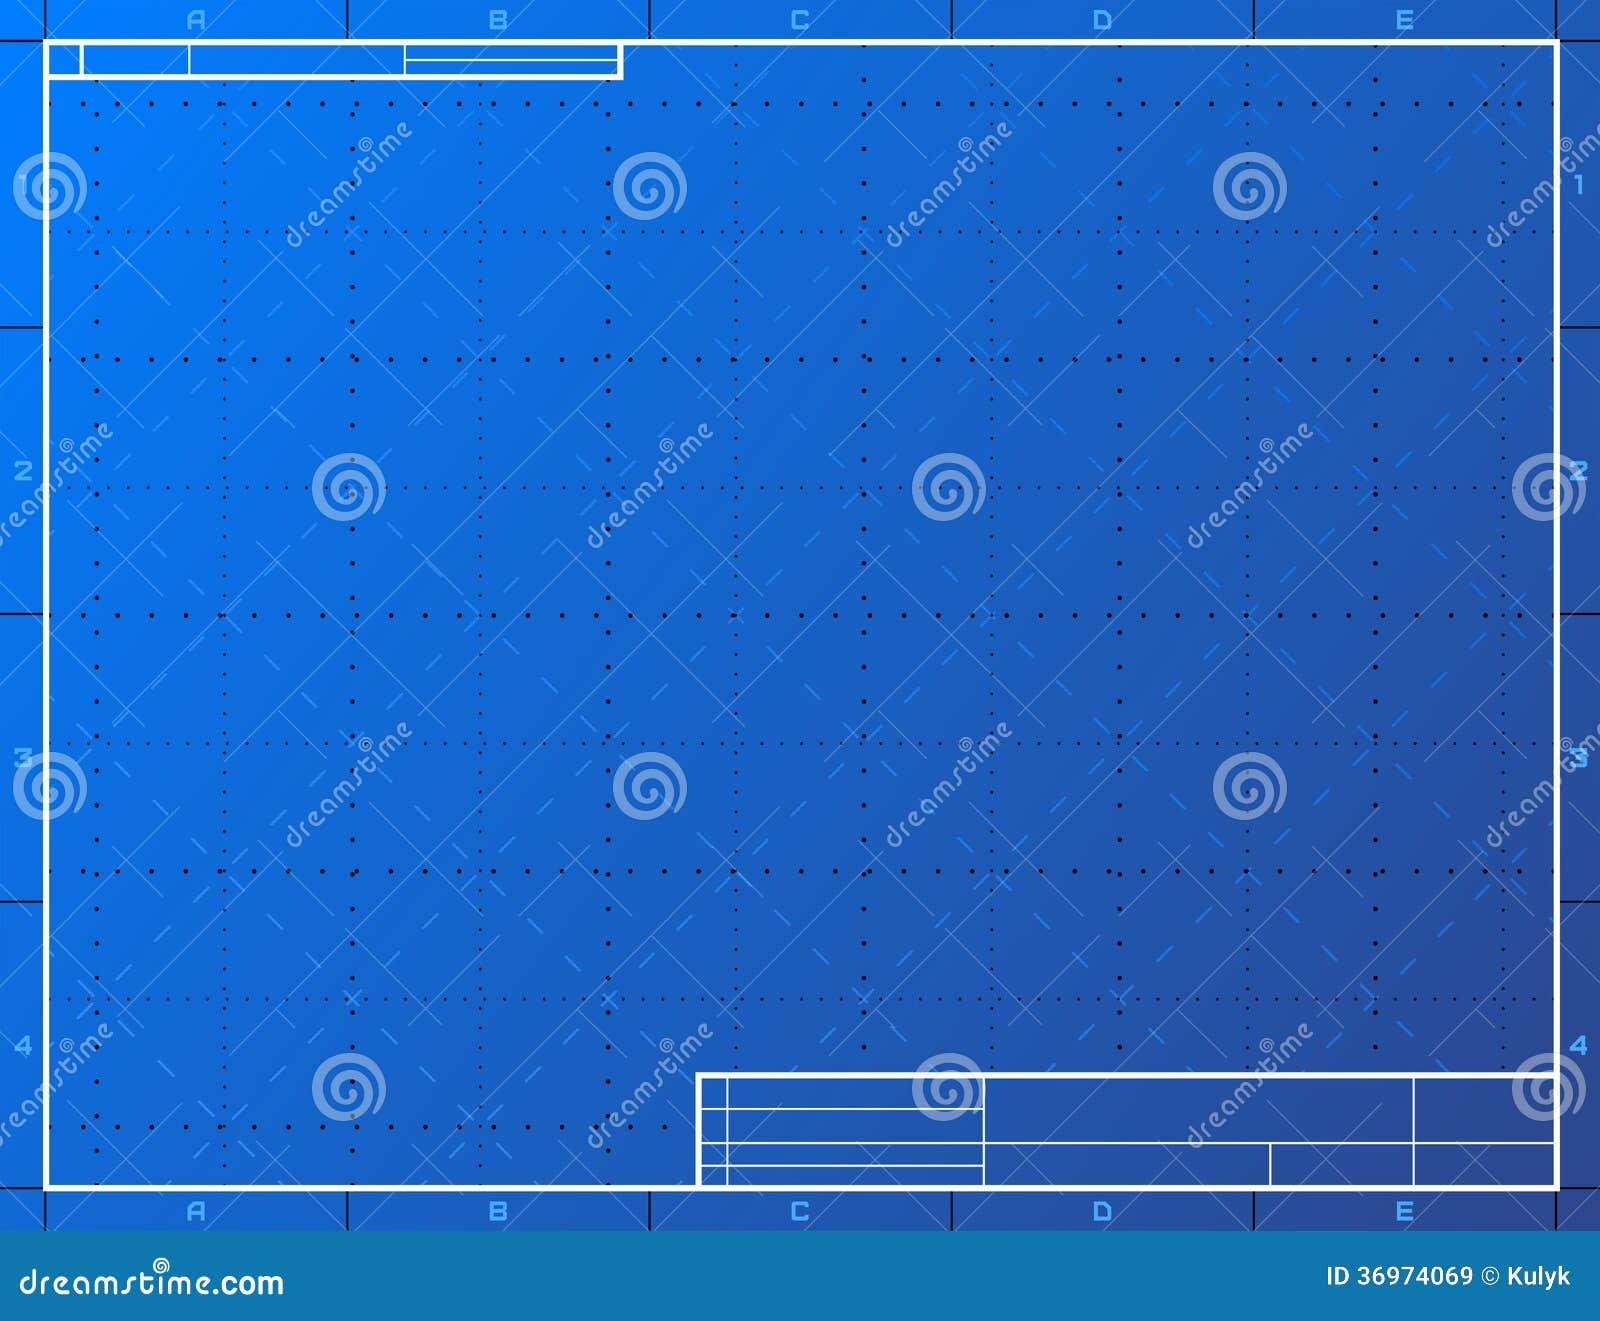 Blank blueprint paper for drafting illustration 36974069 megapixl malvernweather Images